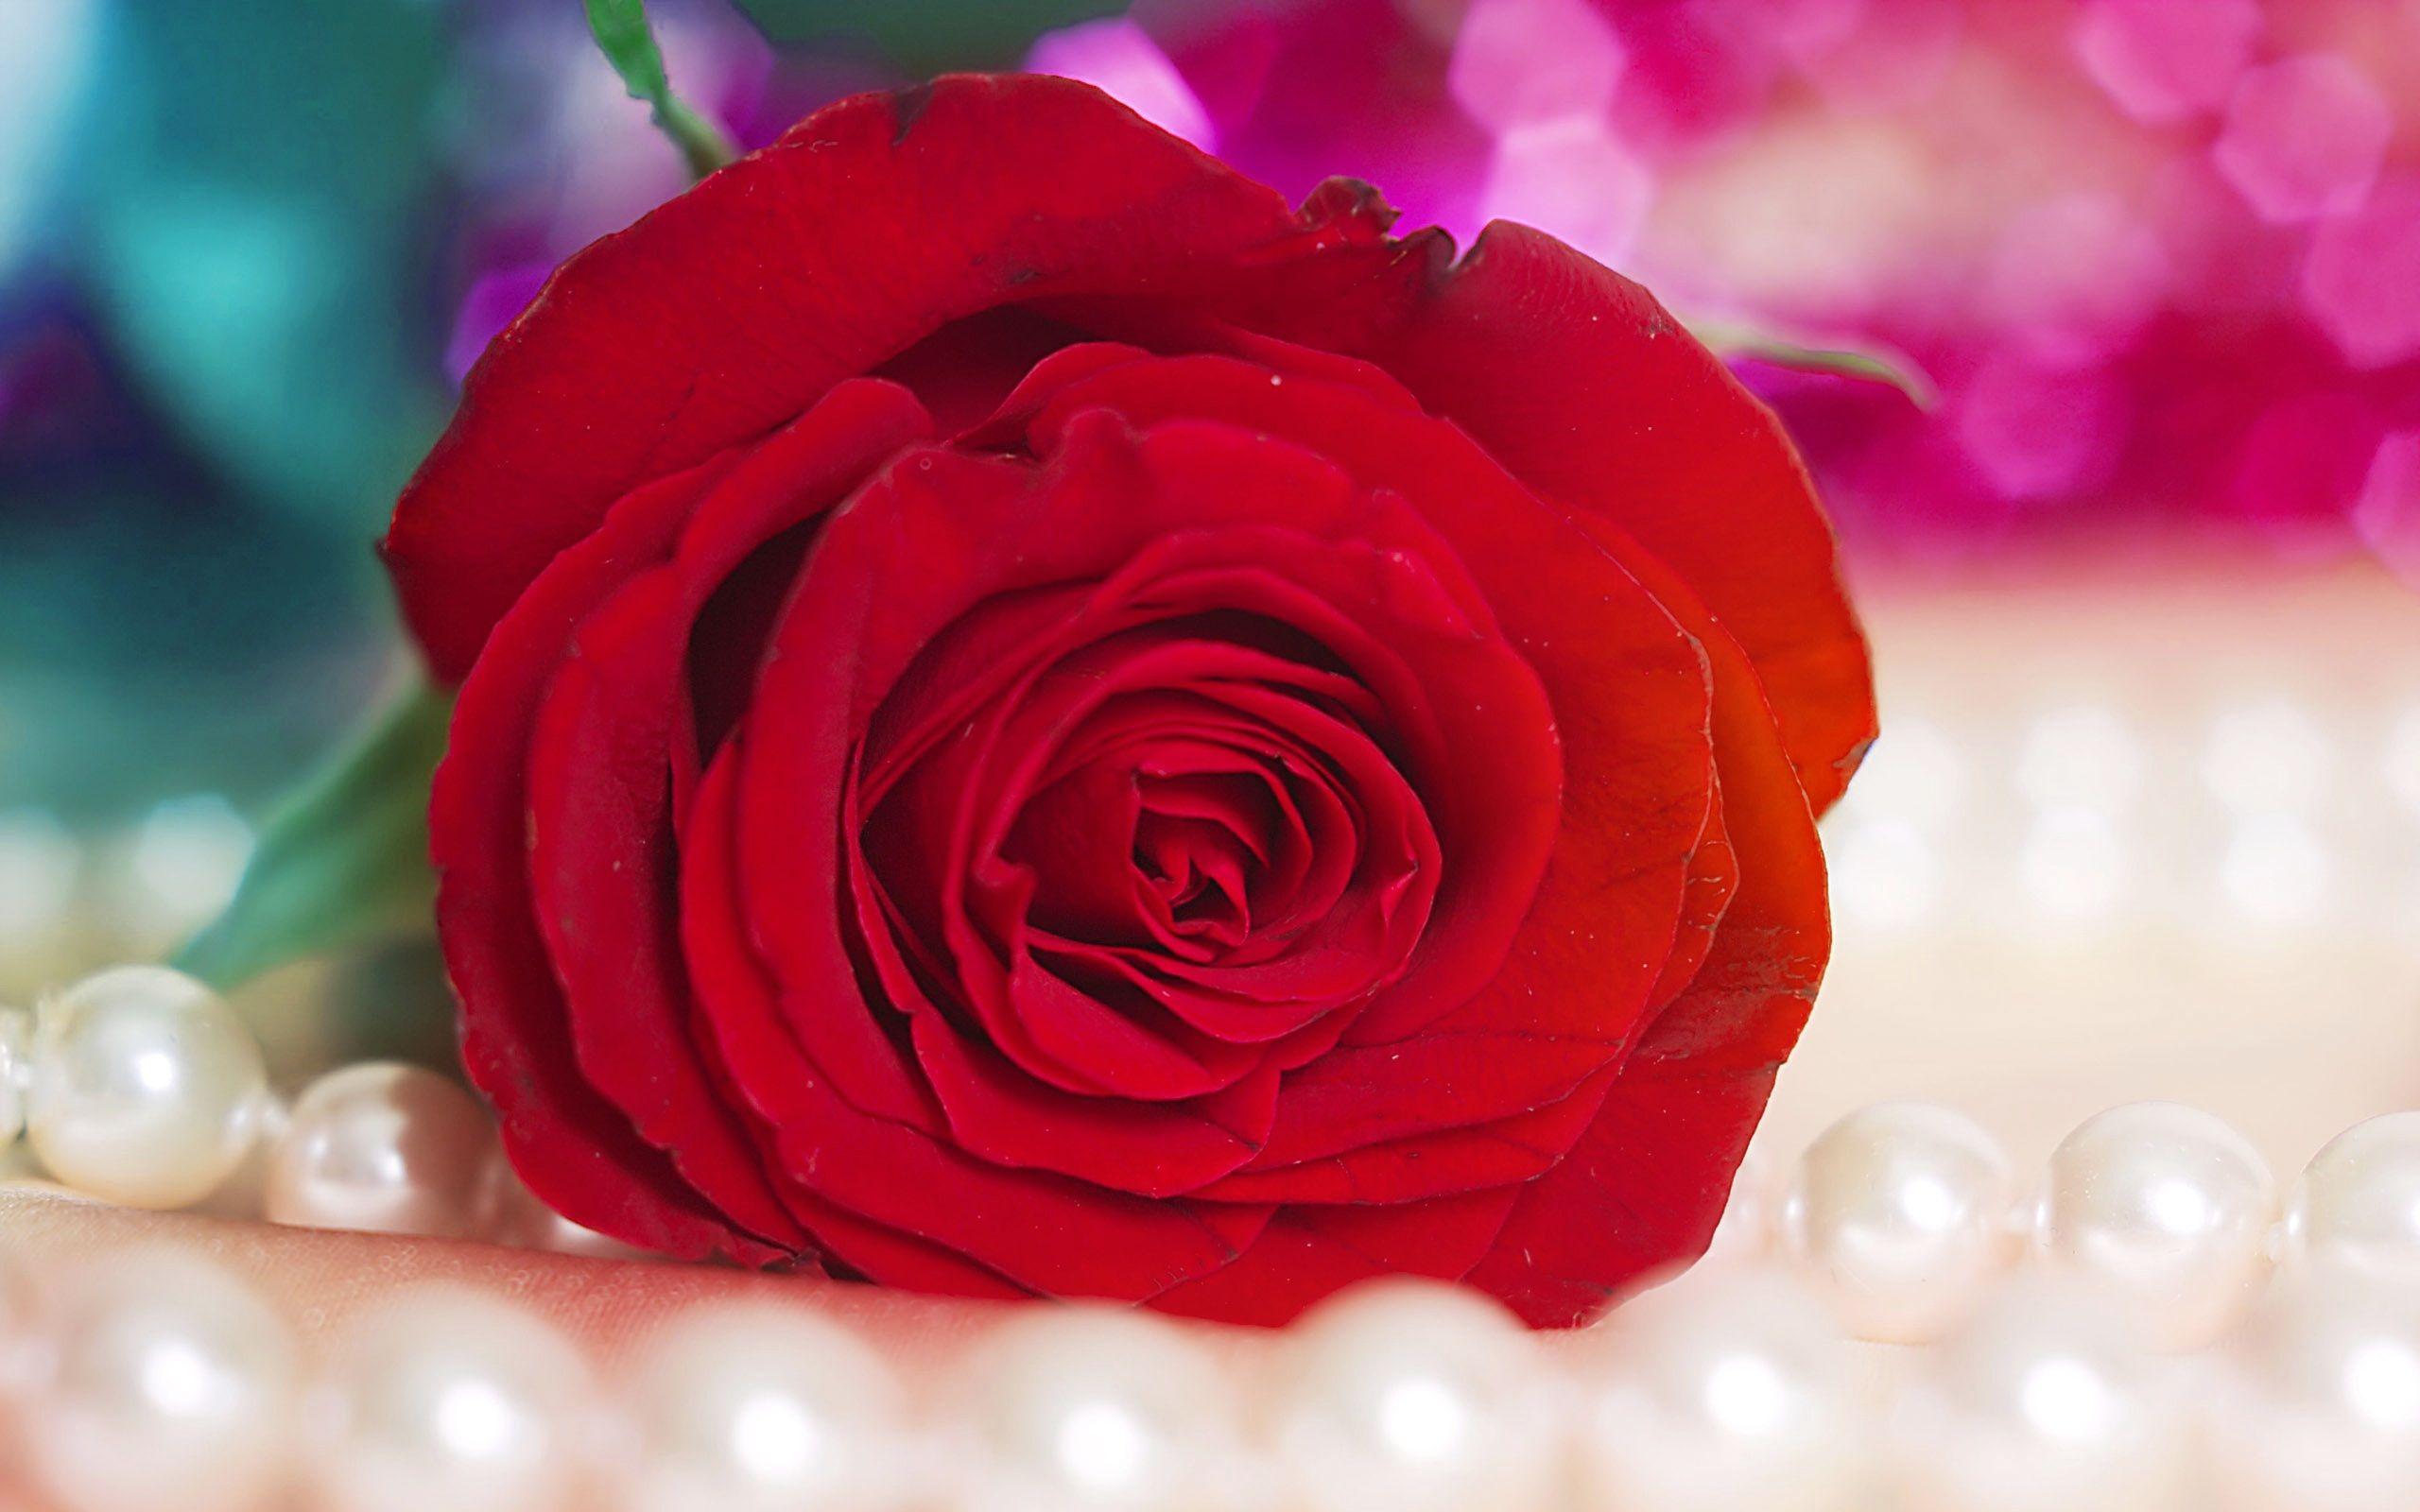 Red Flower Wallpapers High Resolution Rose flower